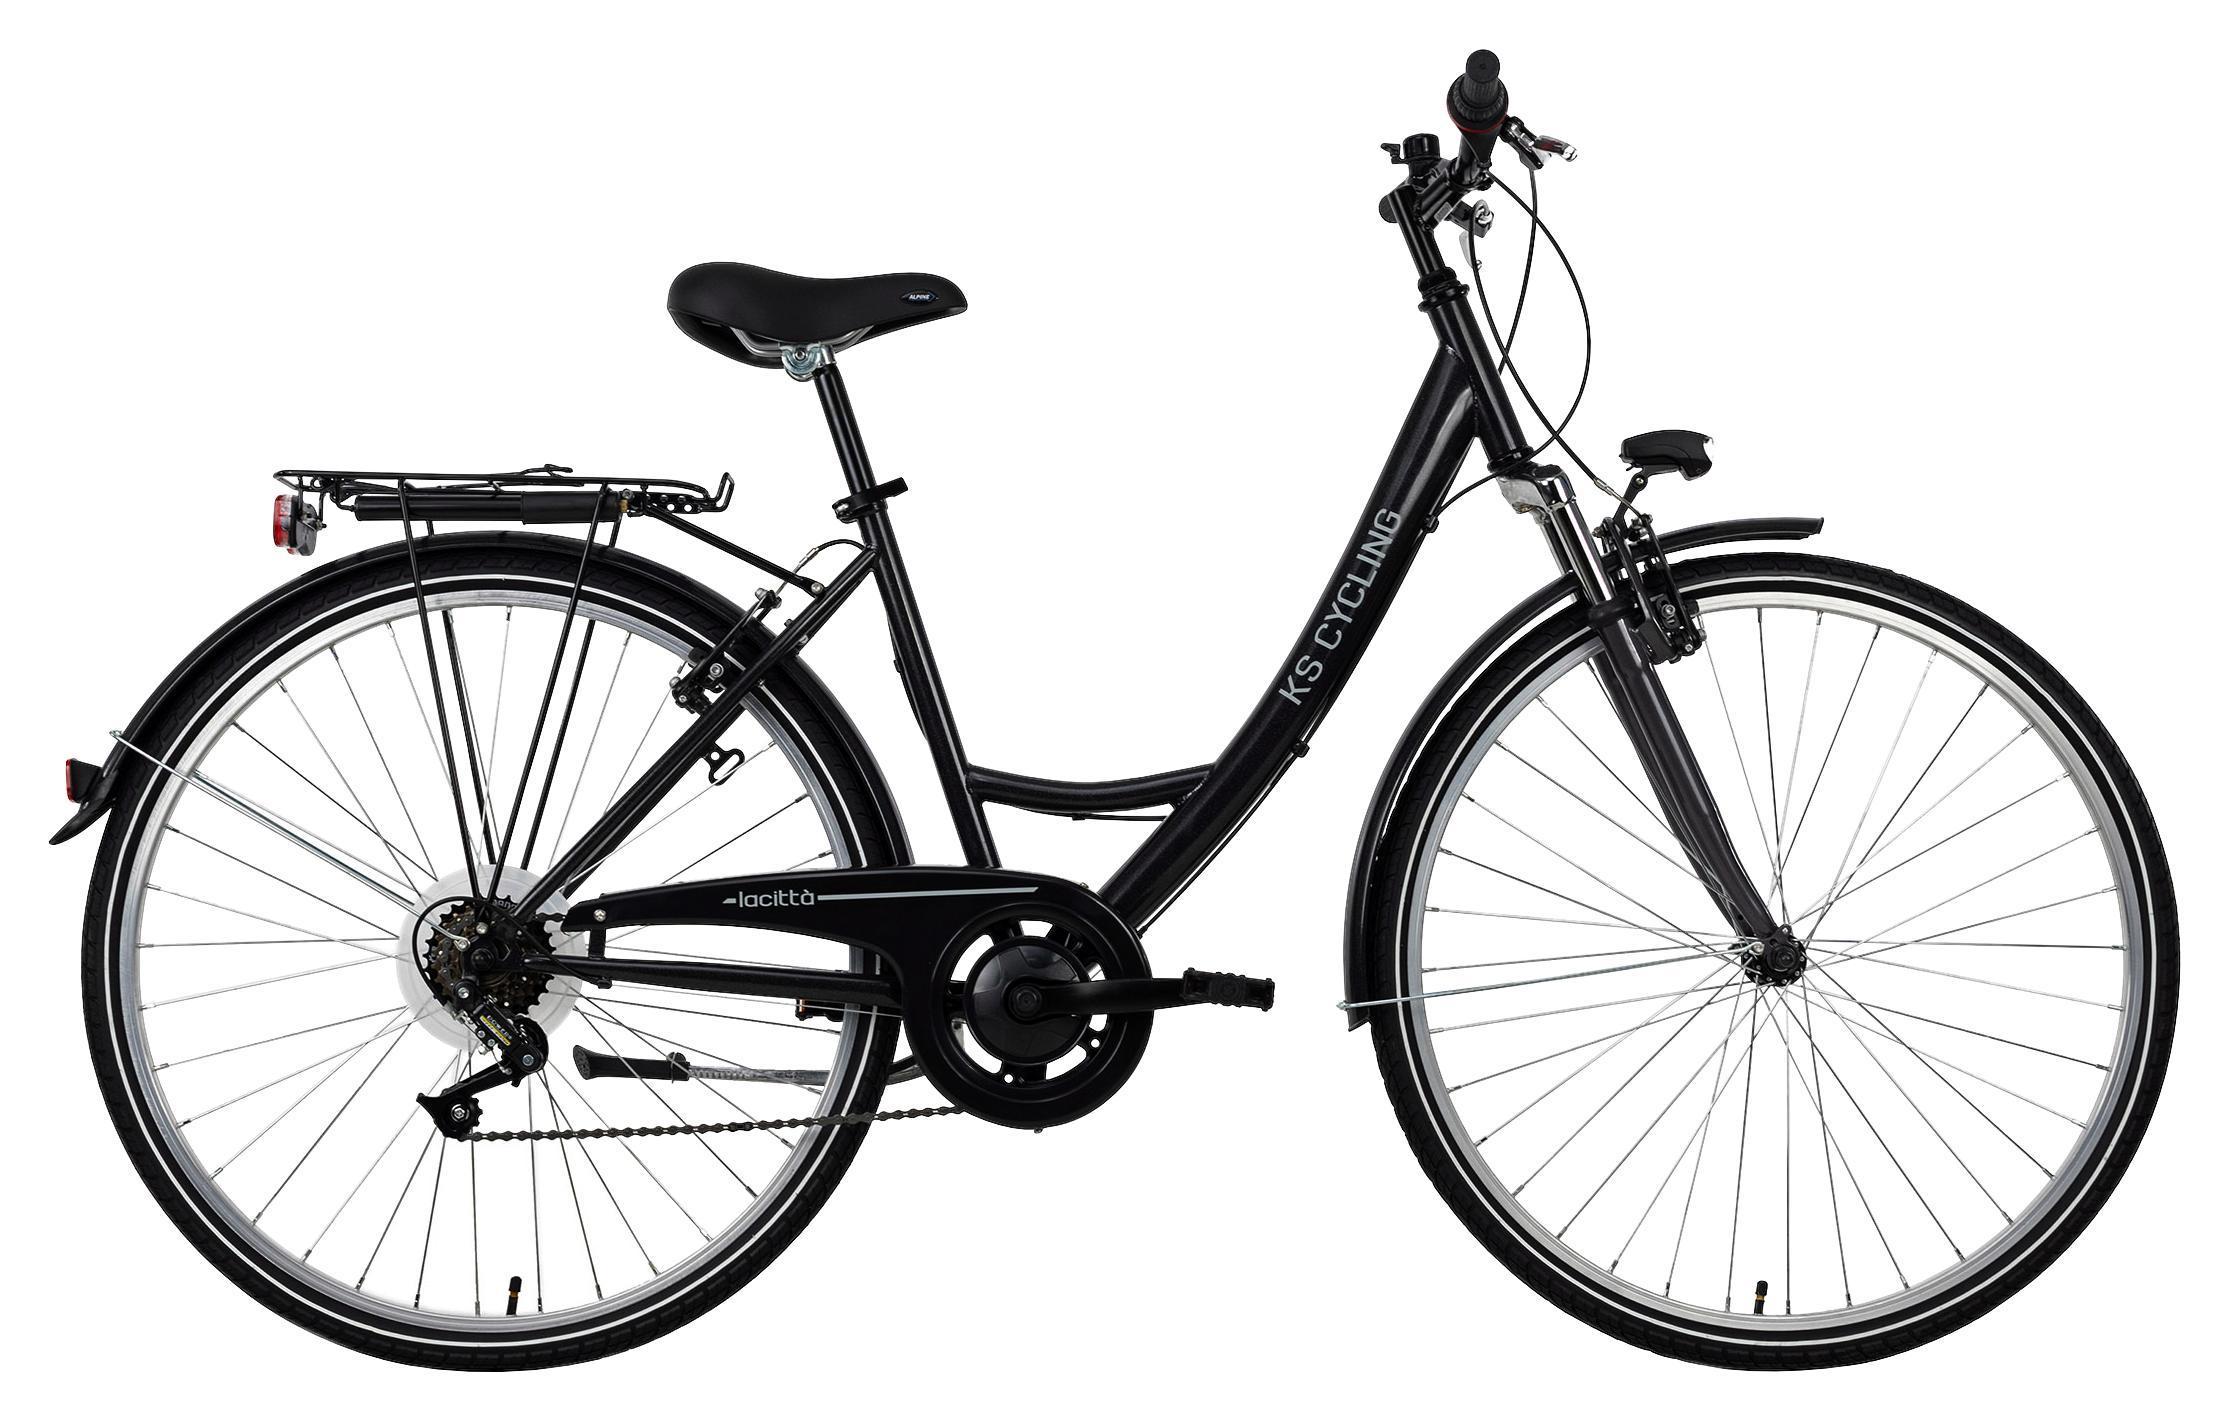 Damen Citybike La Città 317c Anthrazit 28zoll